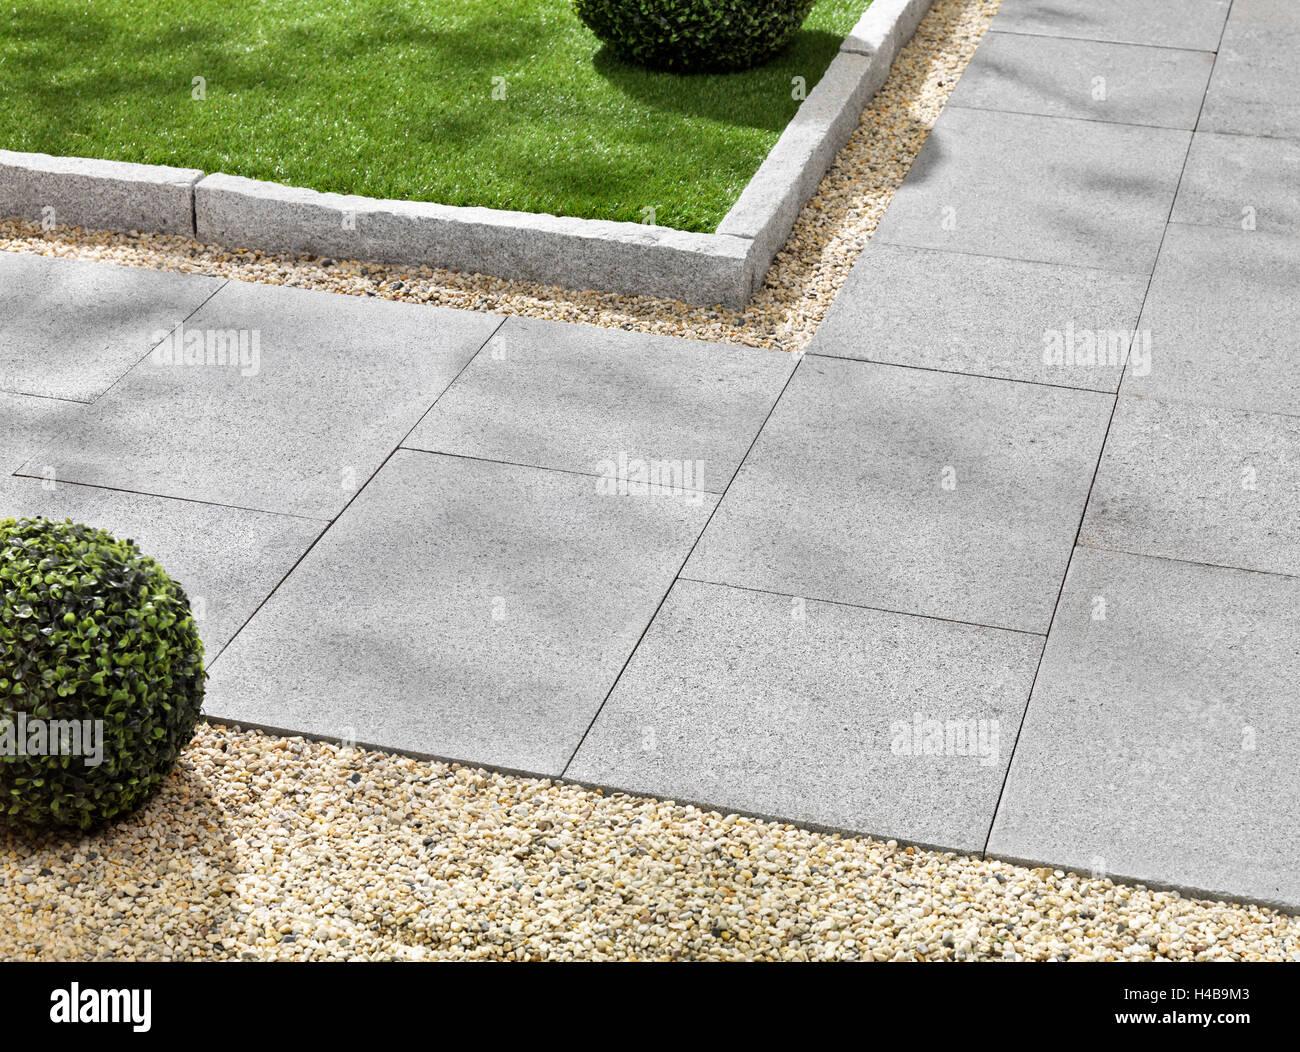 garten gehweg granitplatte f r garten rasenkanten stockfoto bild 123180291 alamy. Black Bedroom Furniture Sets. Home Design Ideas